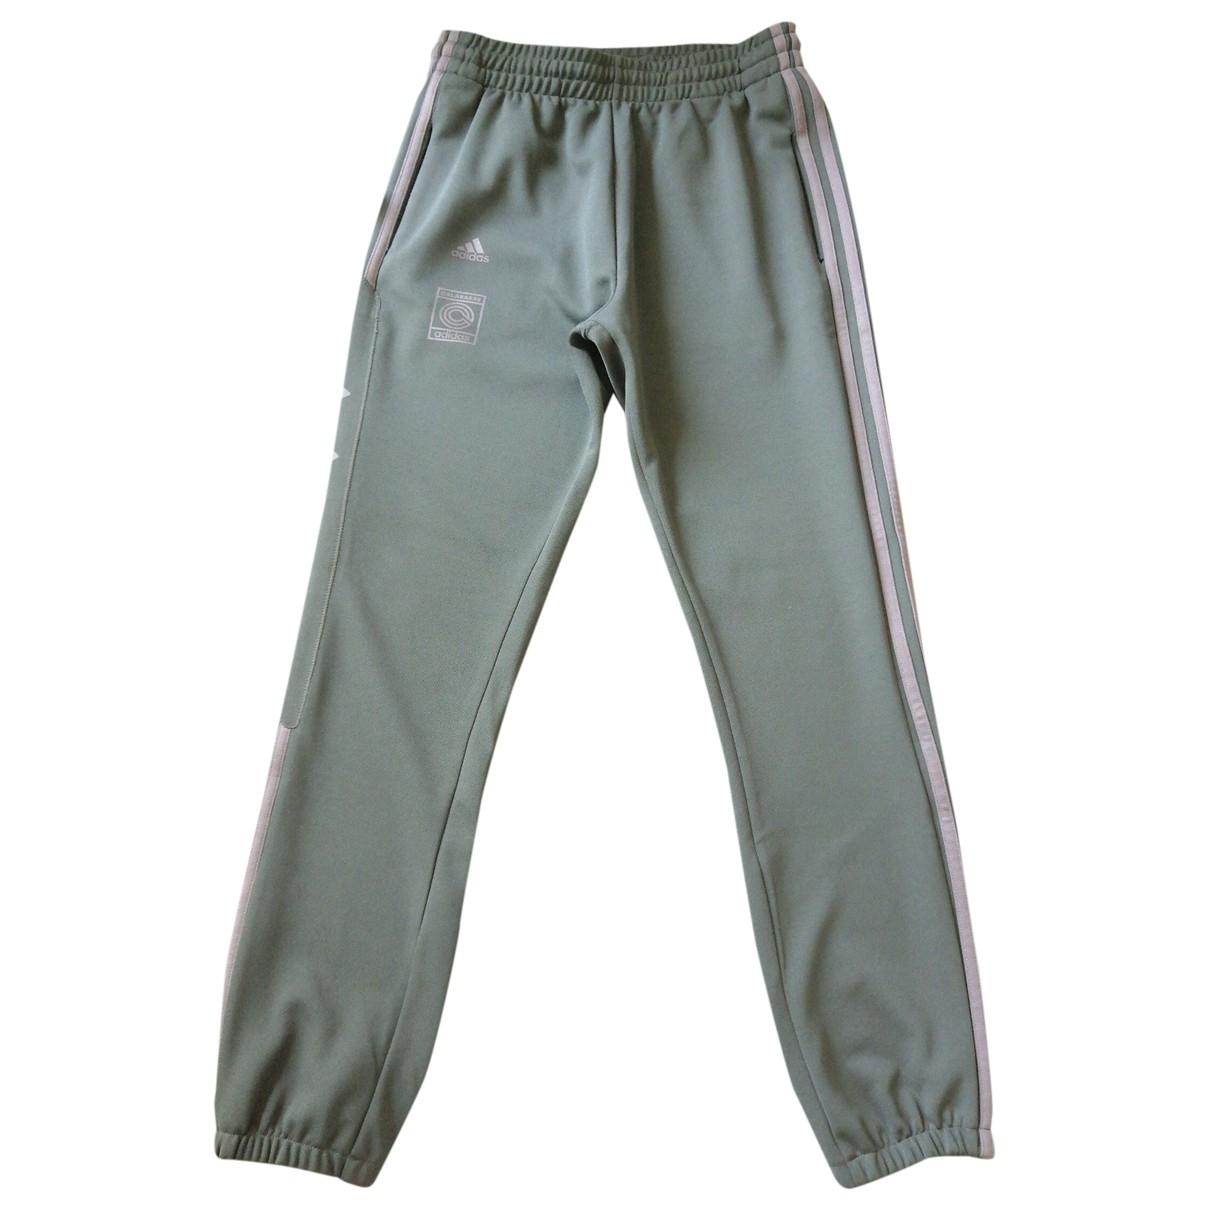 Yeezy X Adidas \N Green Trousers for Men S International